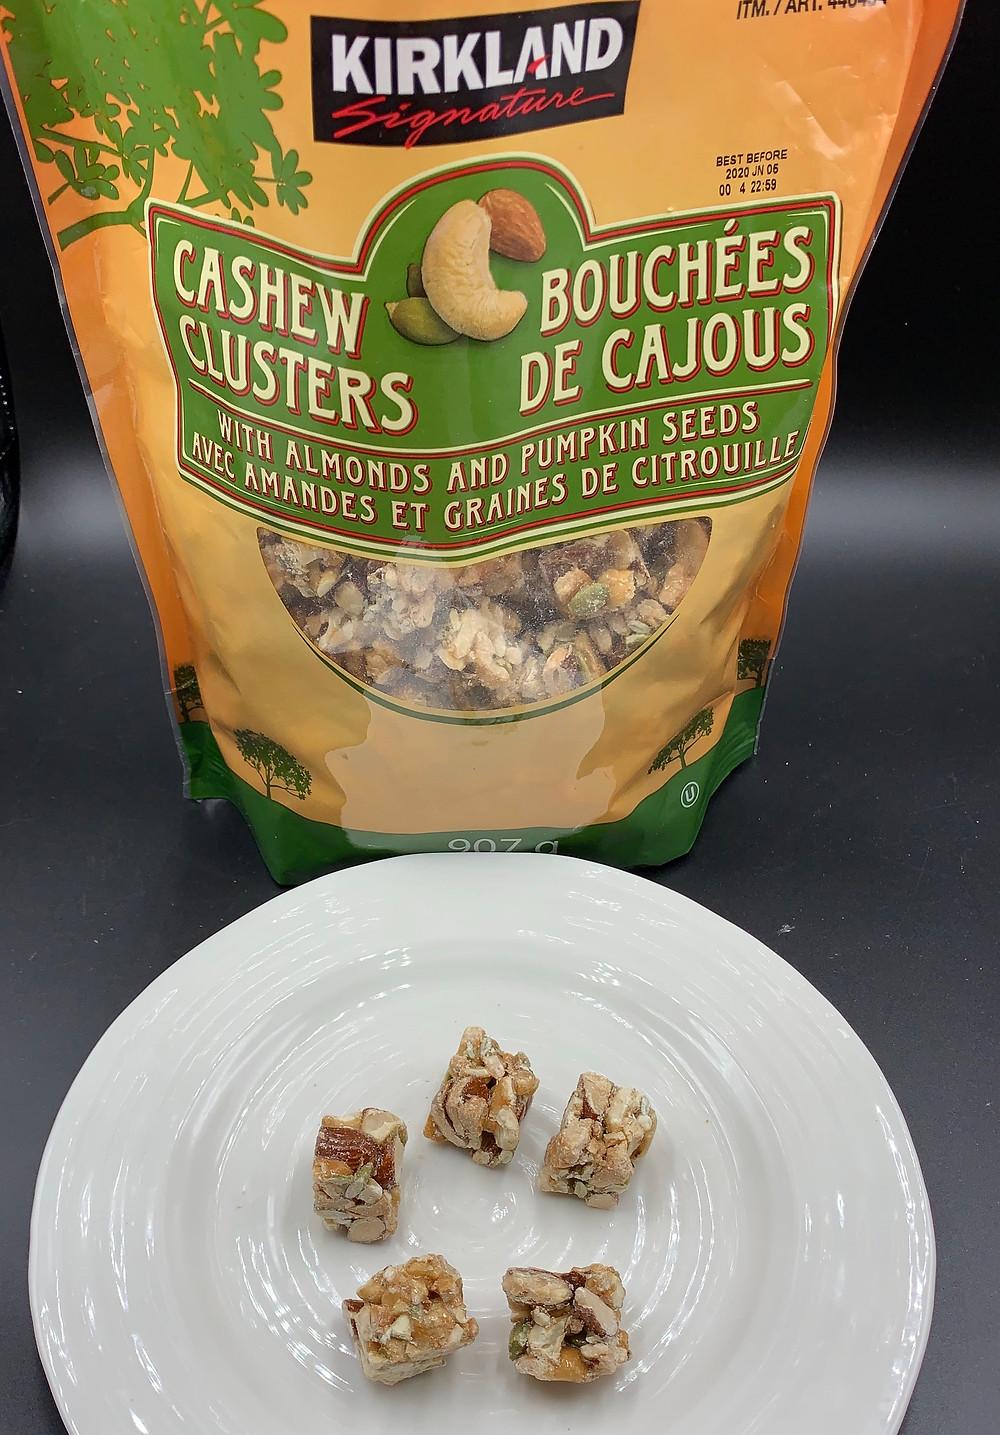 Costco Kirkland Signature Cashew Clusters